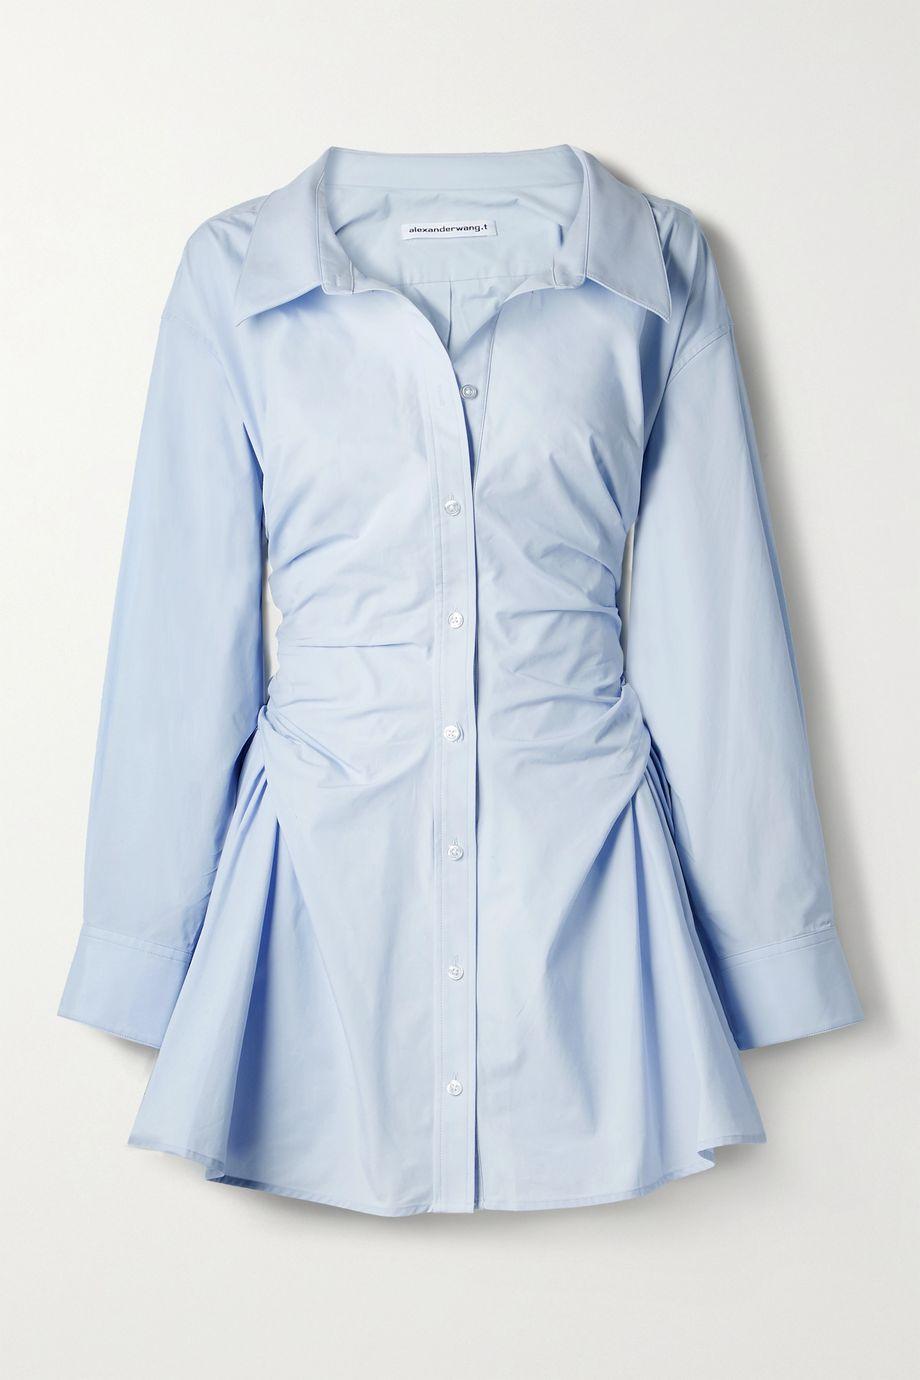 alexanderwang.t Gathered cotton-poplin mini shirt dress